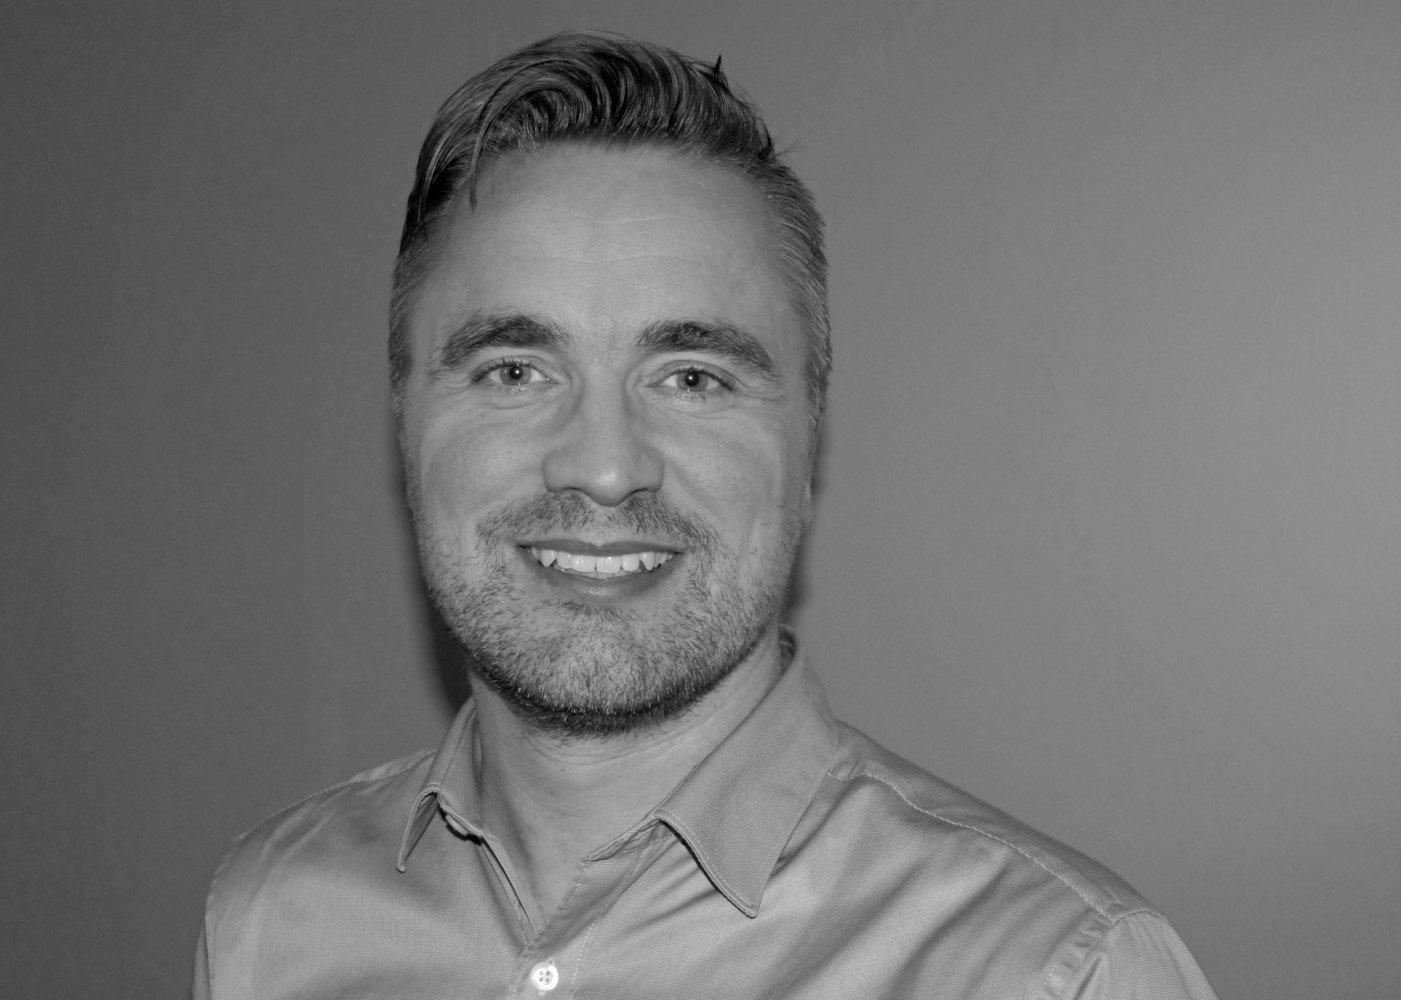 Christian Skov, kanalchef for Xee